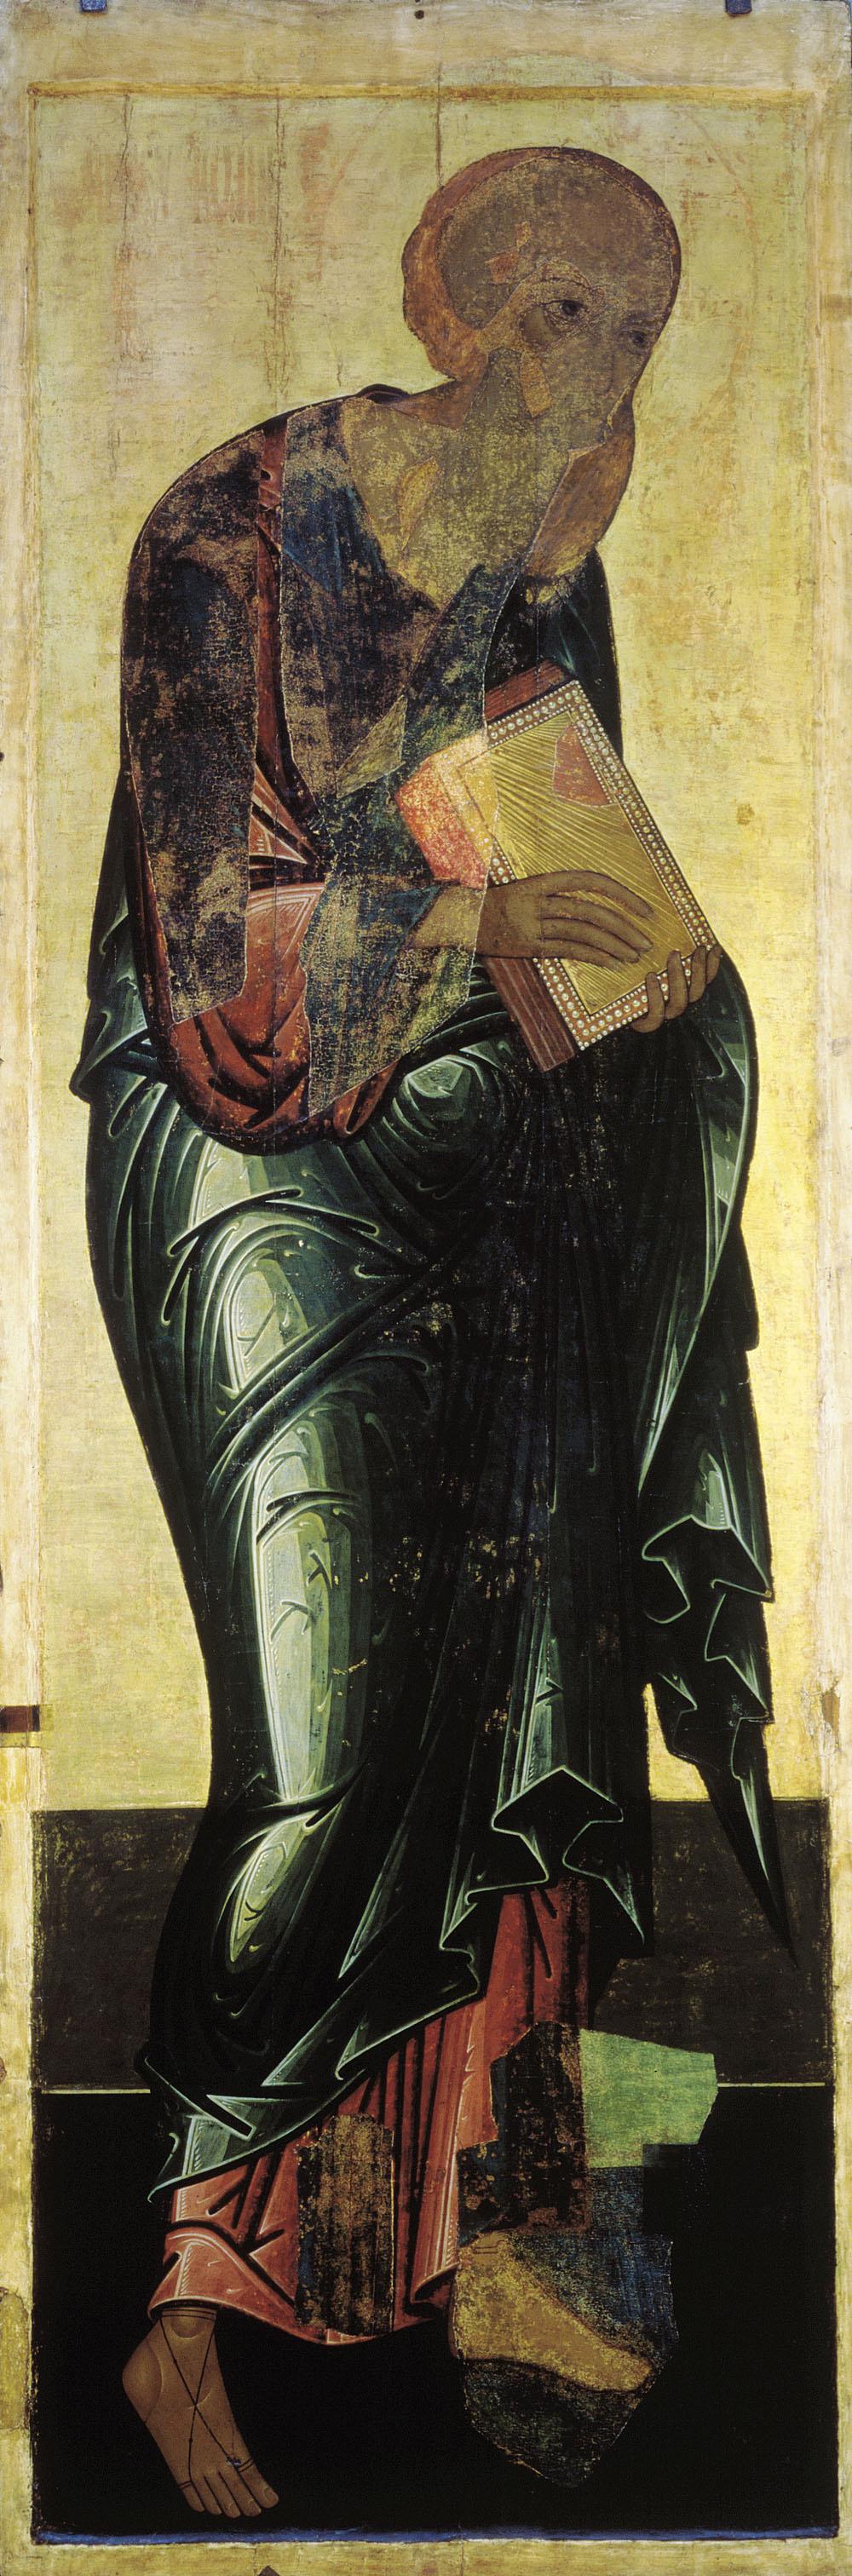 Andrey Rublev. John the Theologian